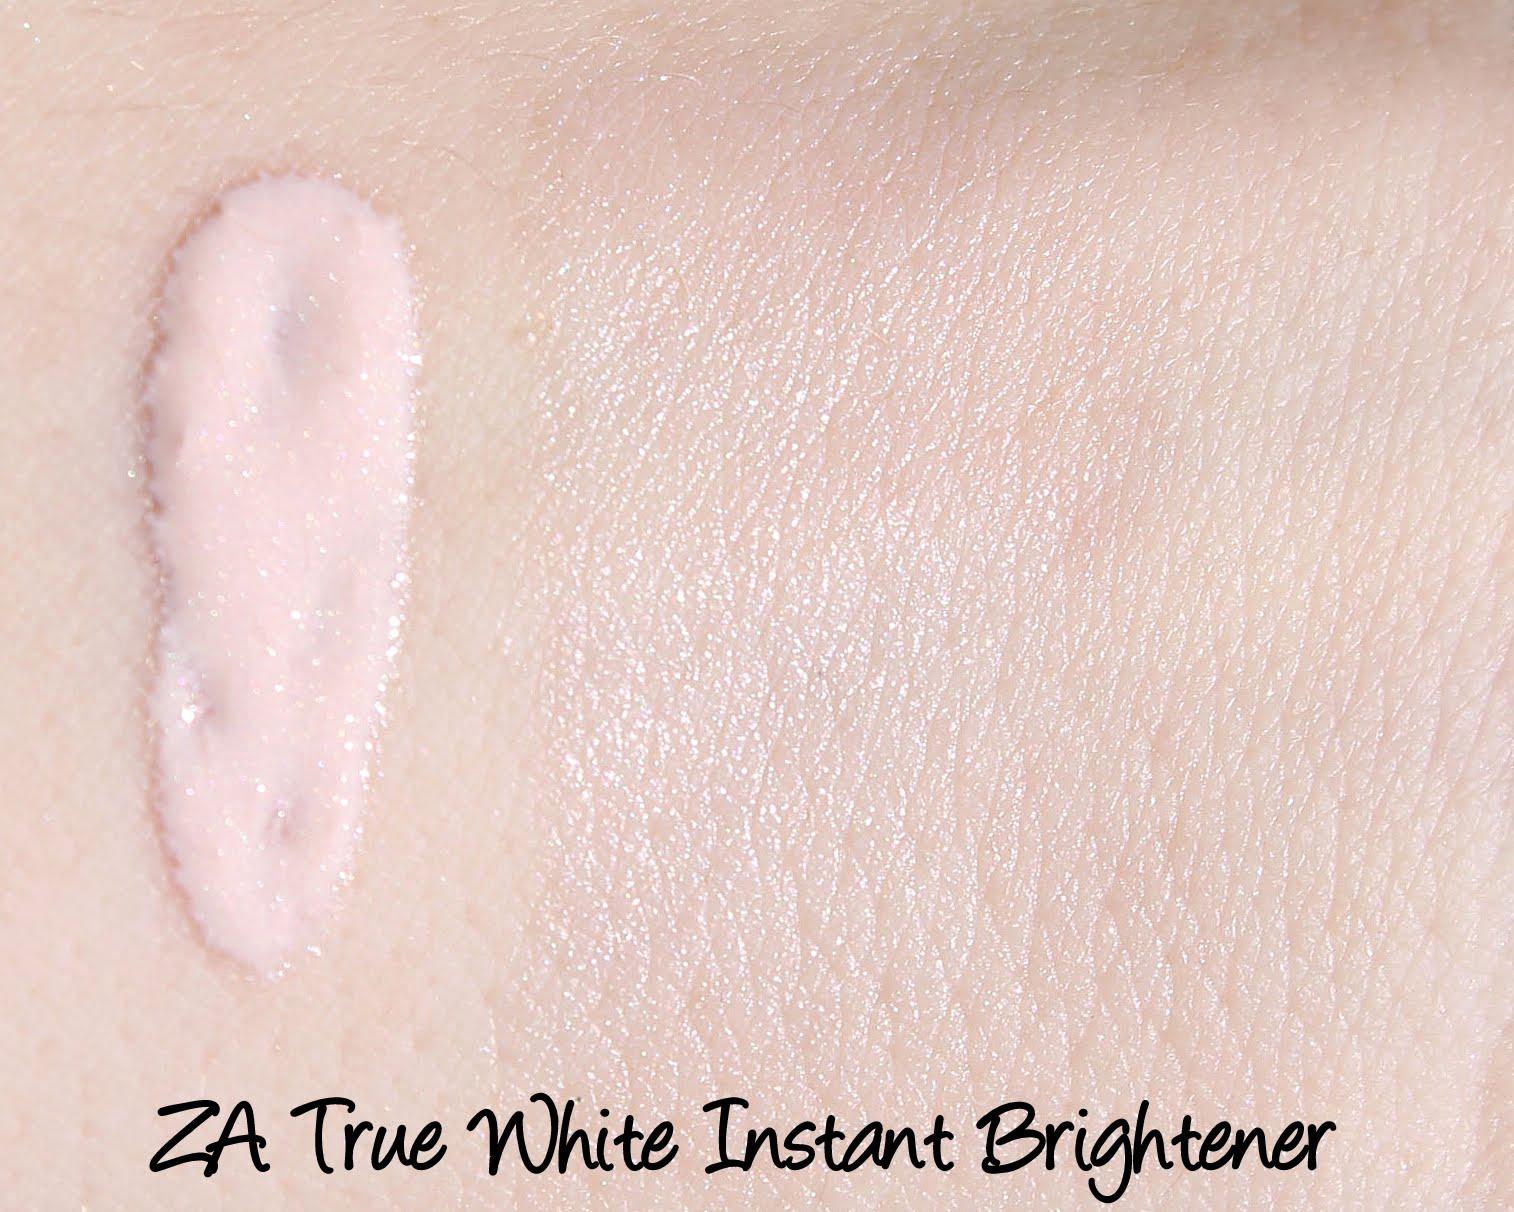 ZA True White Instant Brightener Swatches & Review